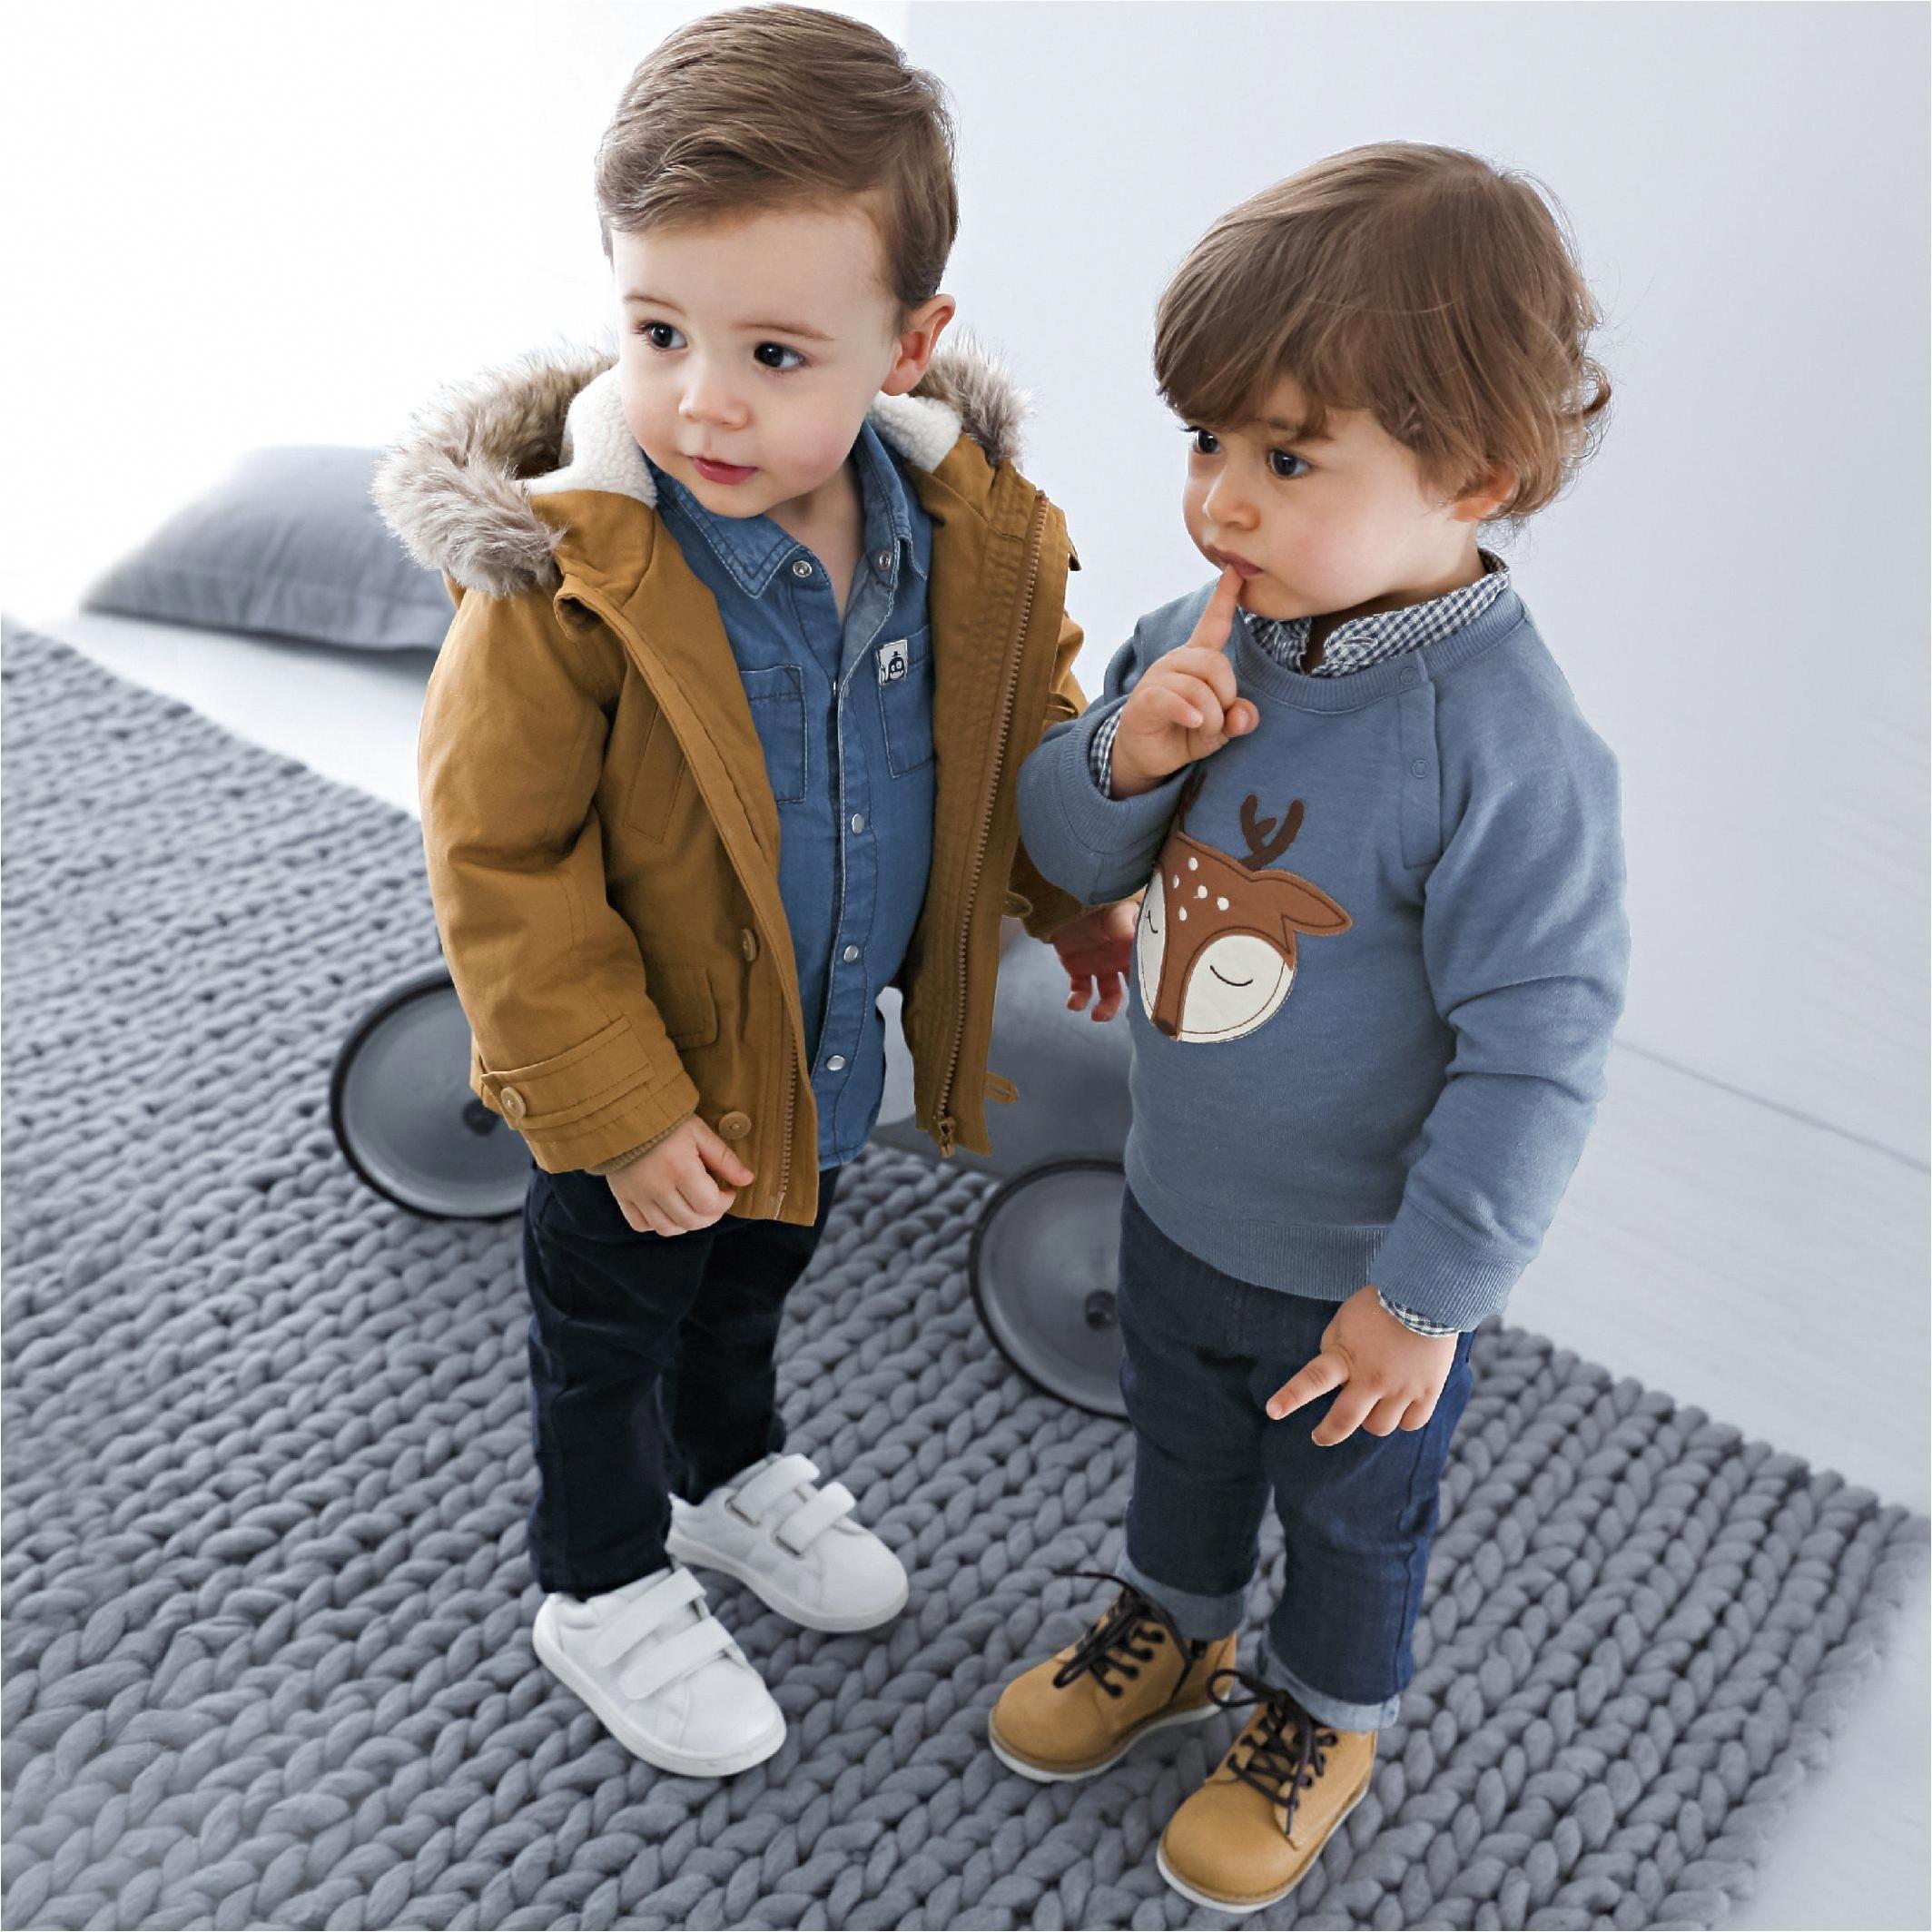 Baby Clothing Shop Best Kids Fashion Childrens